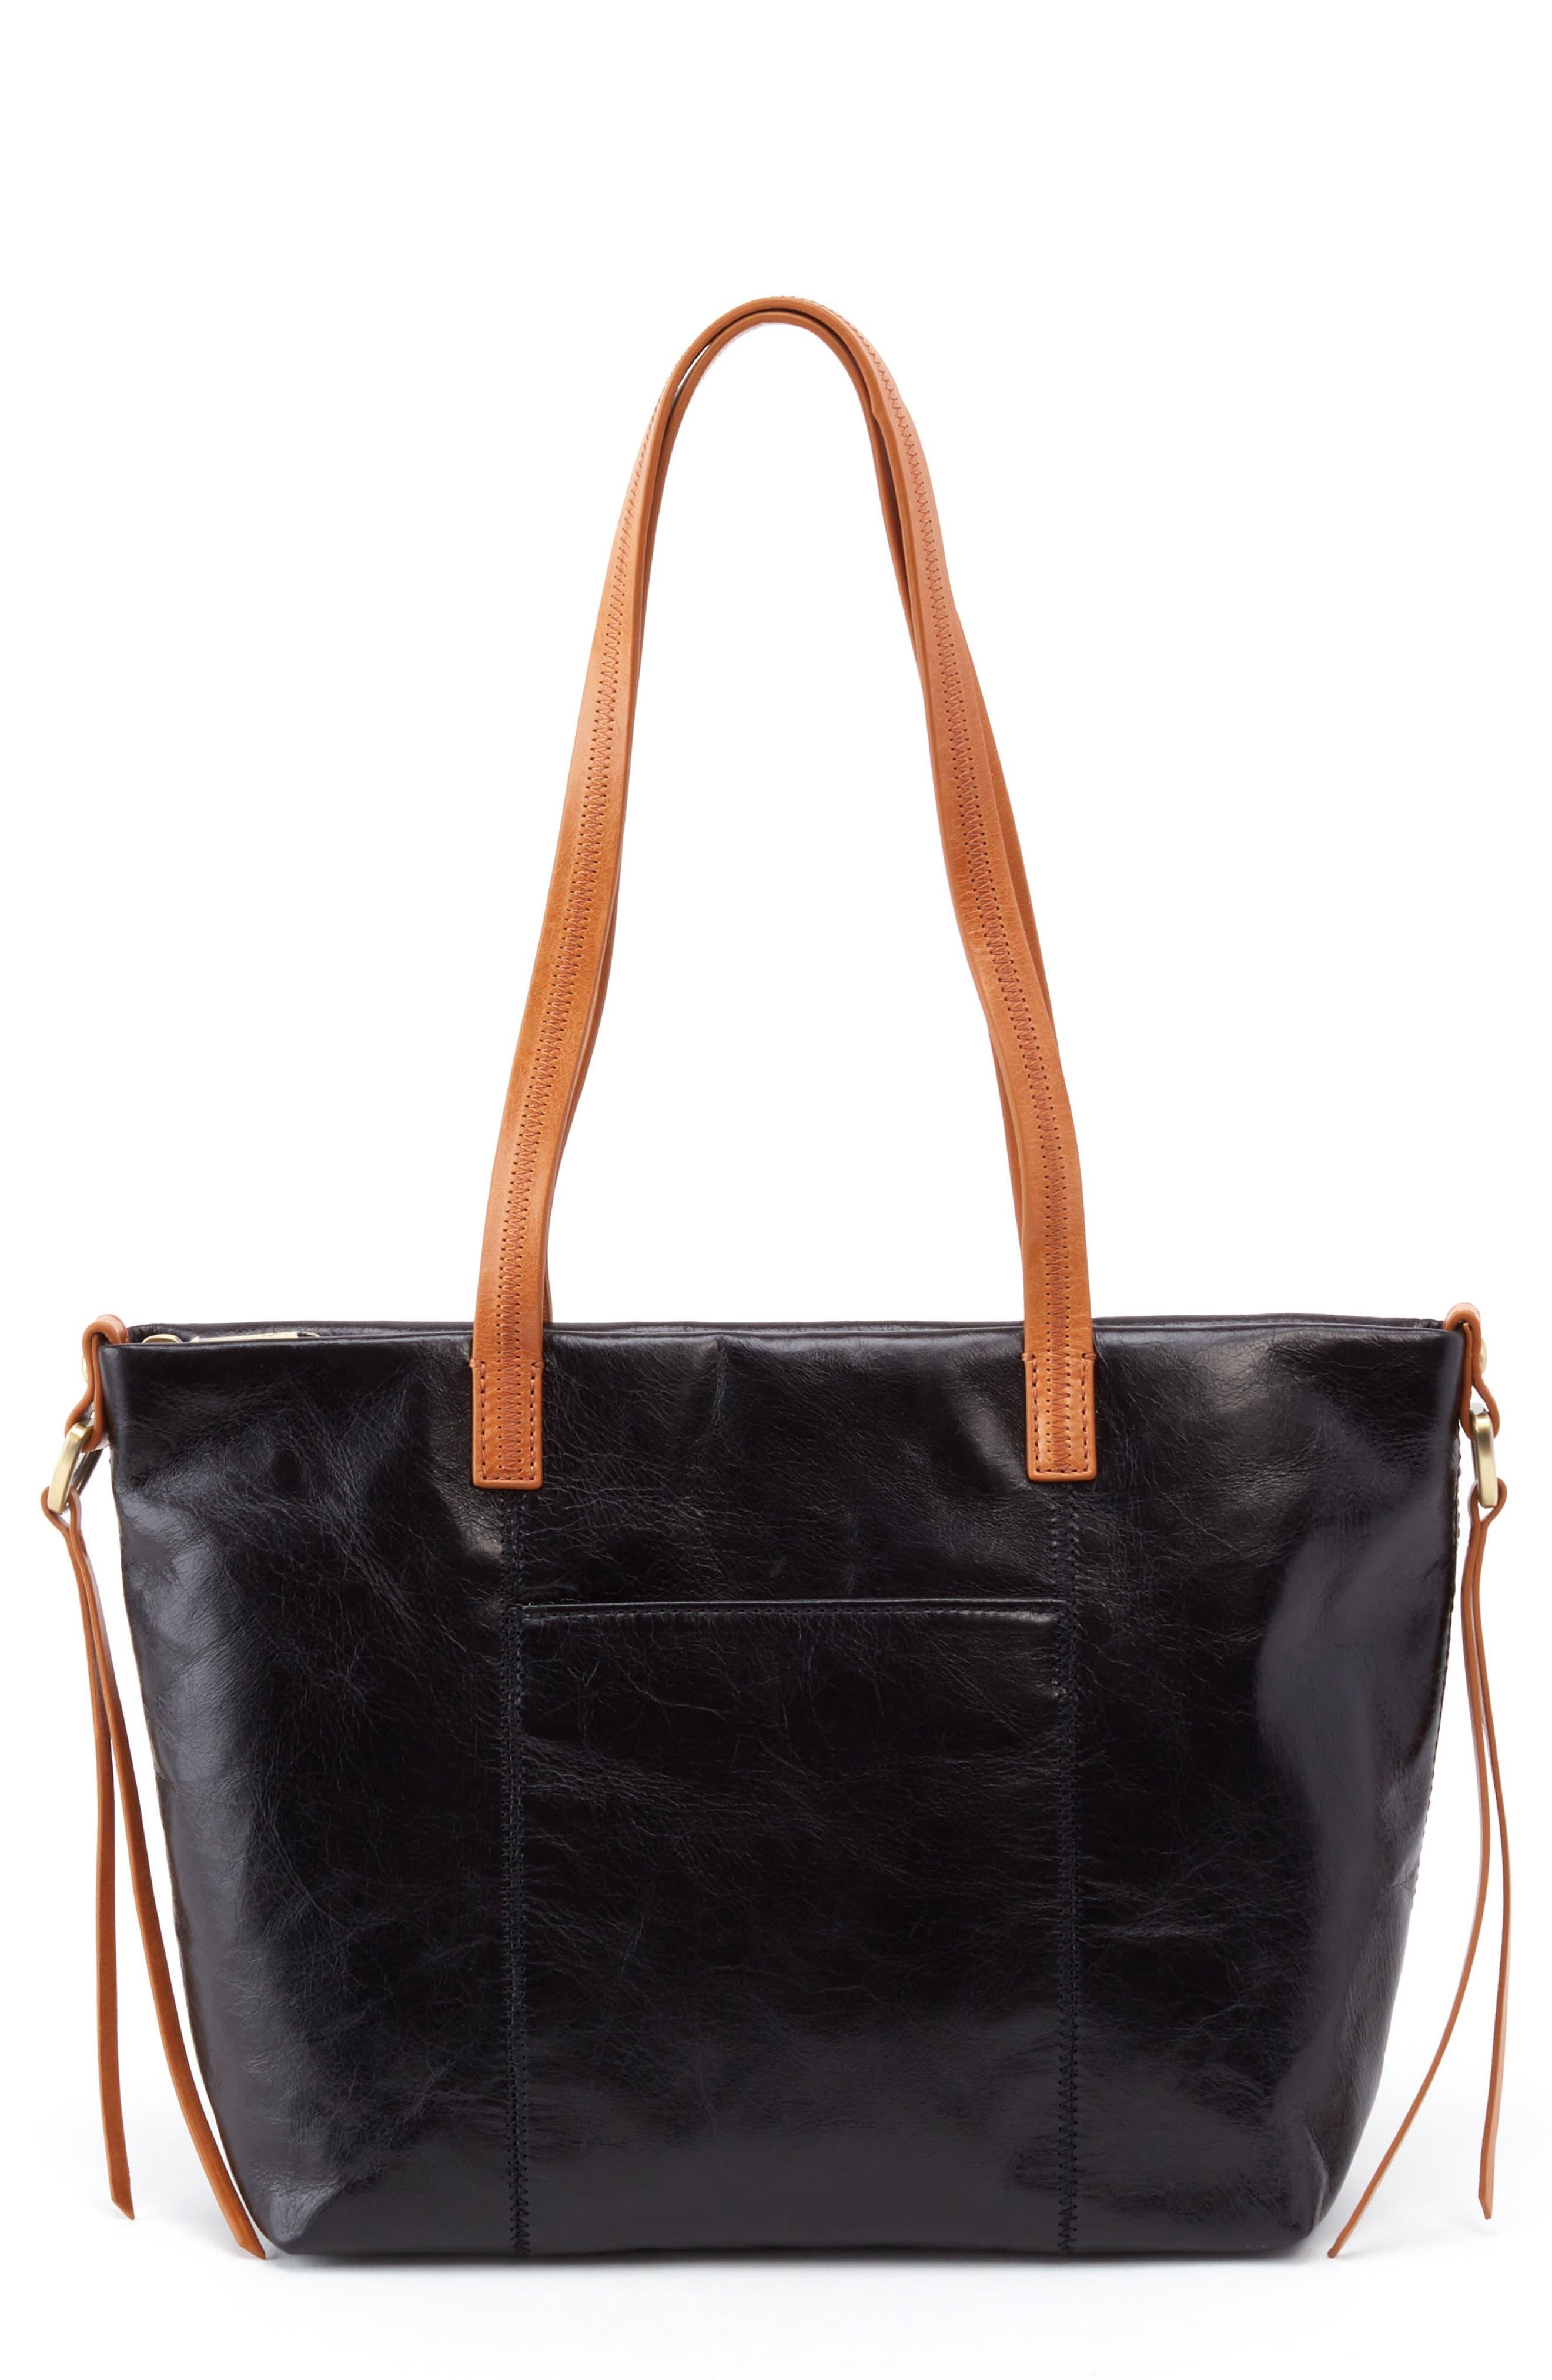 Cecily Leather Tote,                         Main,                         color, Black